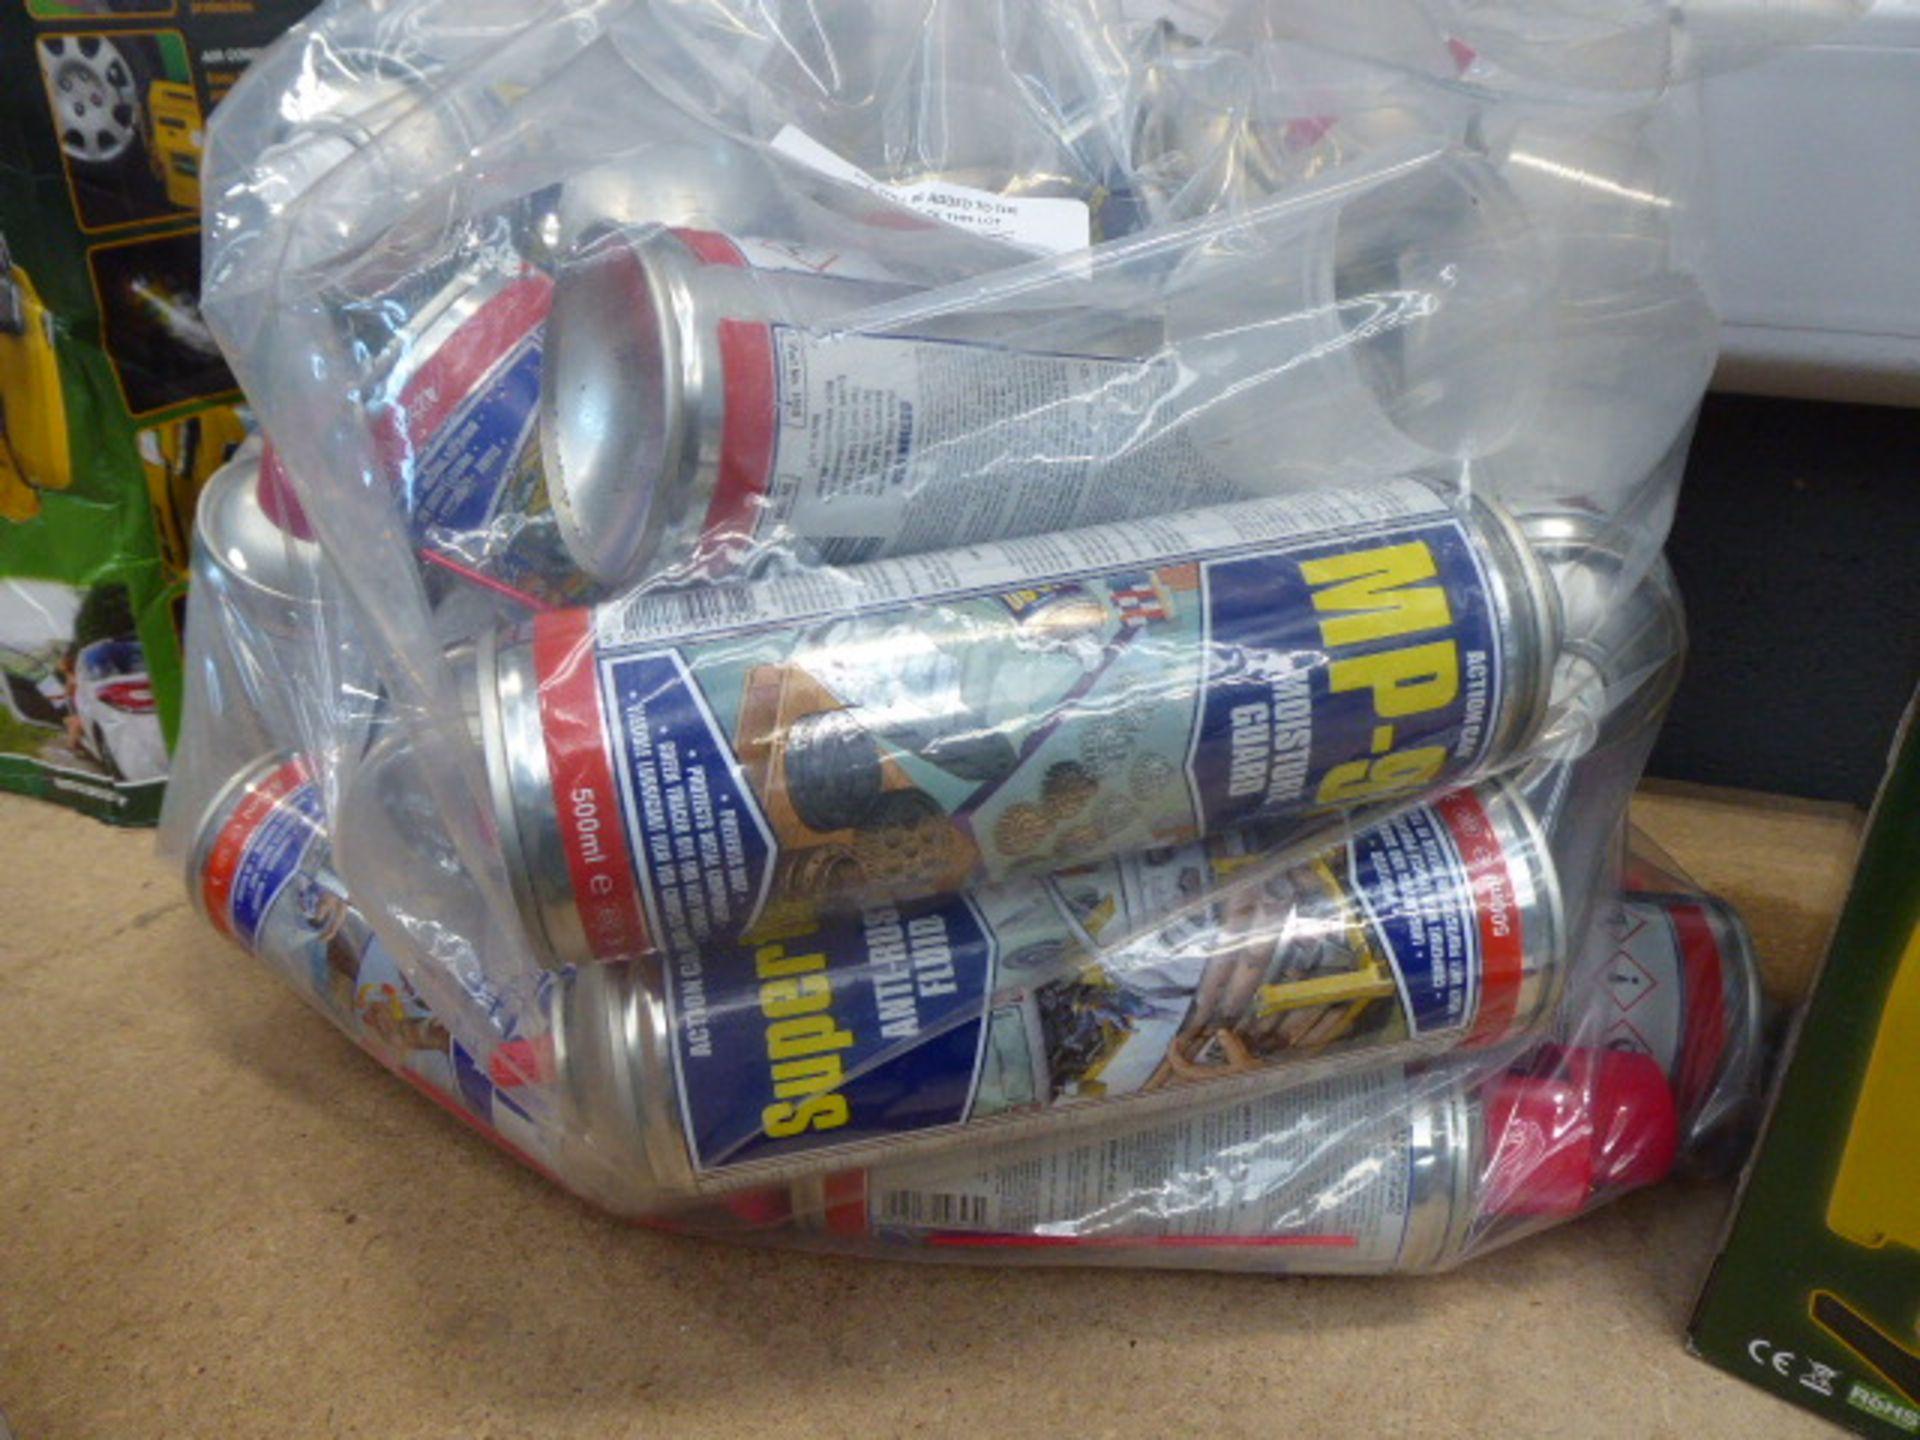 Bag of Moisture Guard anti-rust fluid and multi purpose lubricant